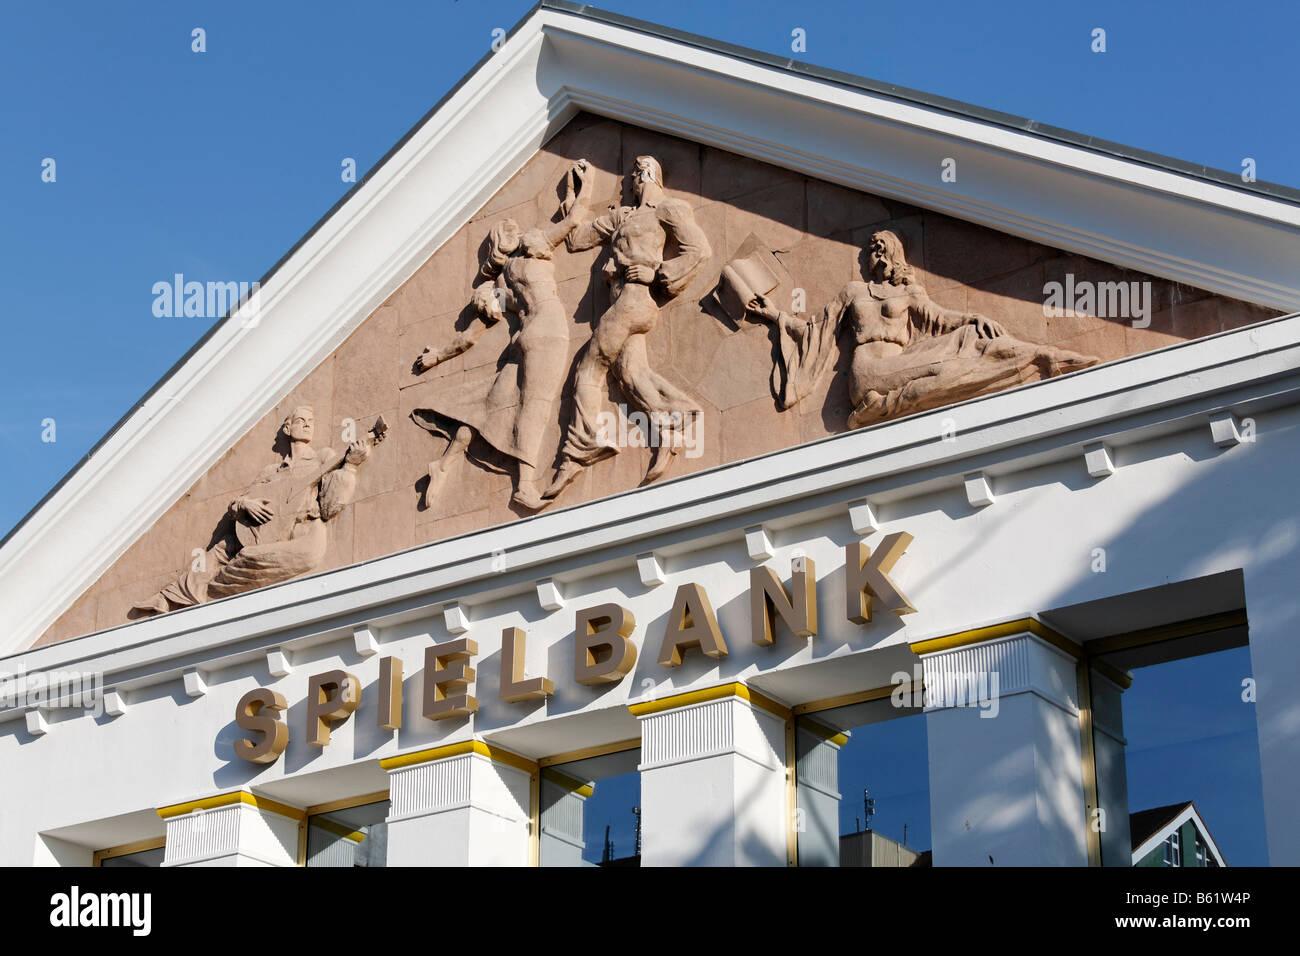 Frieze on the Heringsdorf Casino building, Usedom Island, Baltic Sea, Mecklenburg-Western Pomerania, Germany, Europe Stock Photo